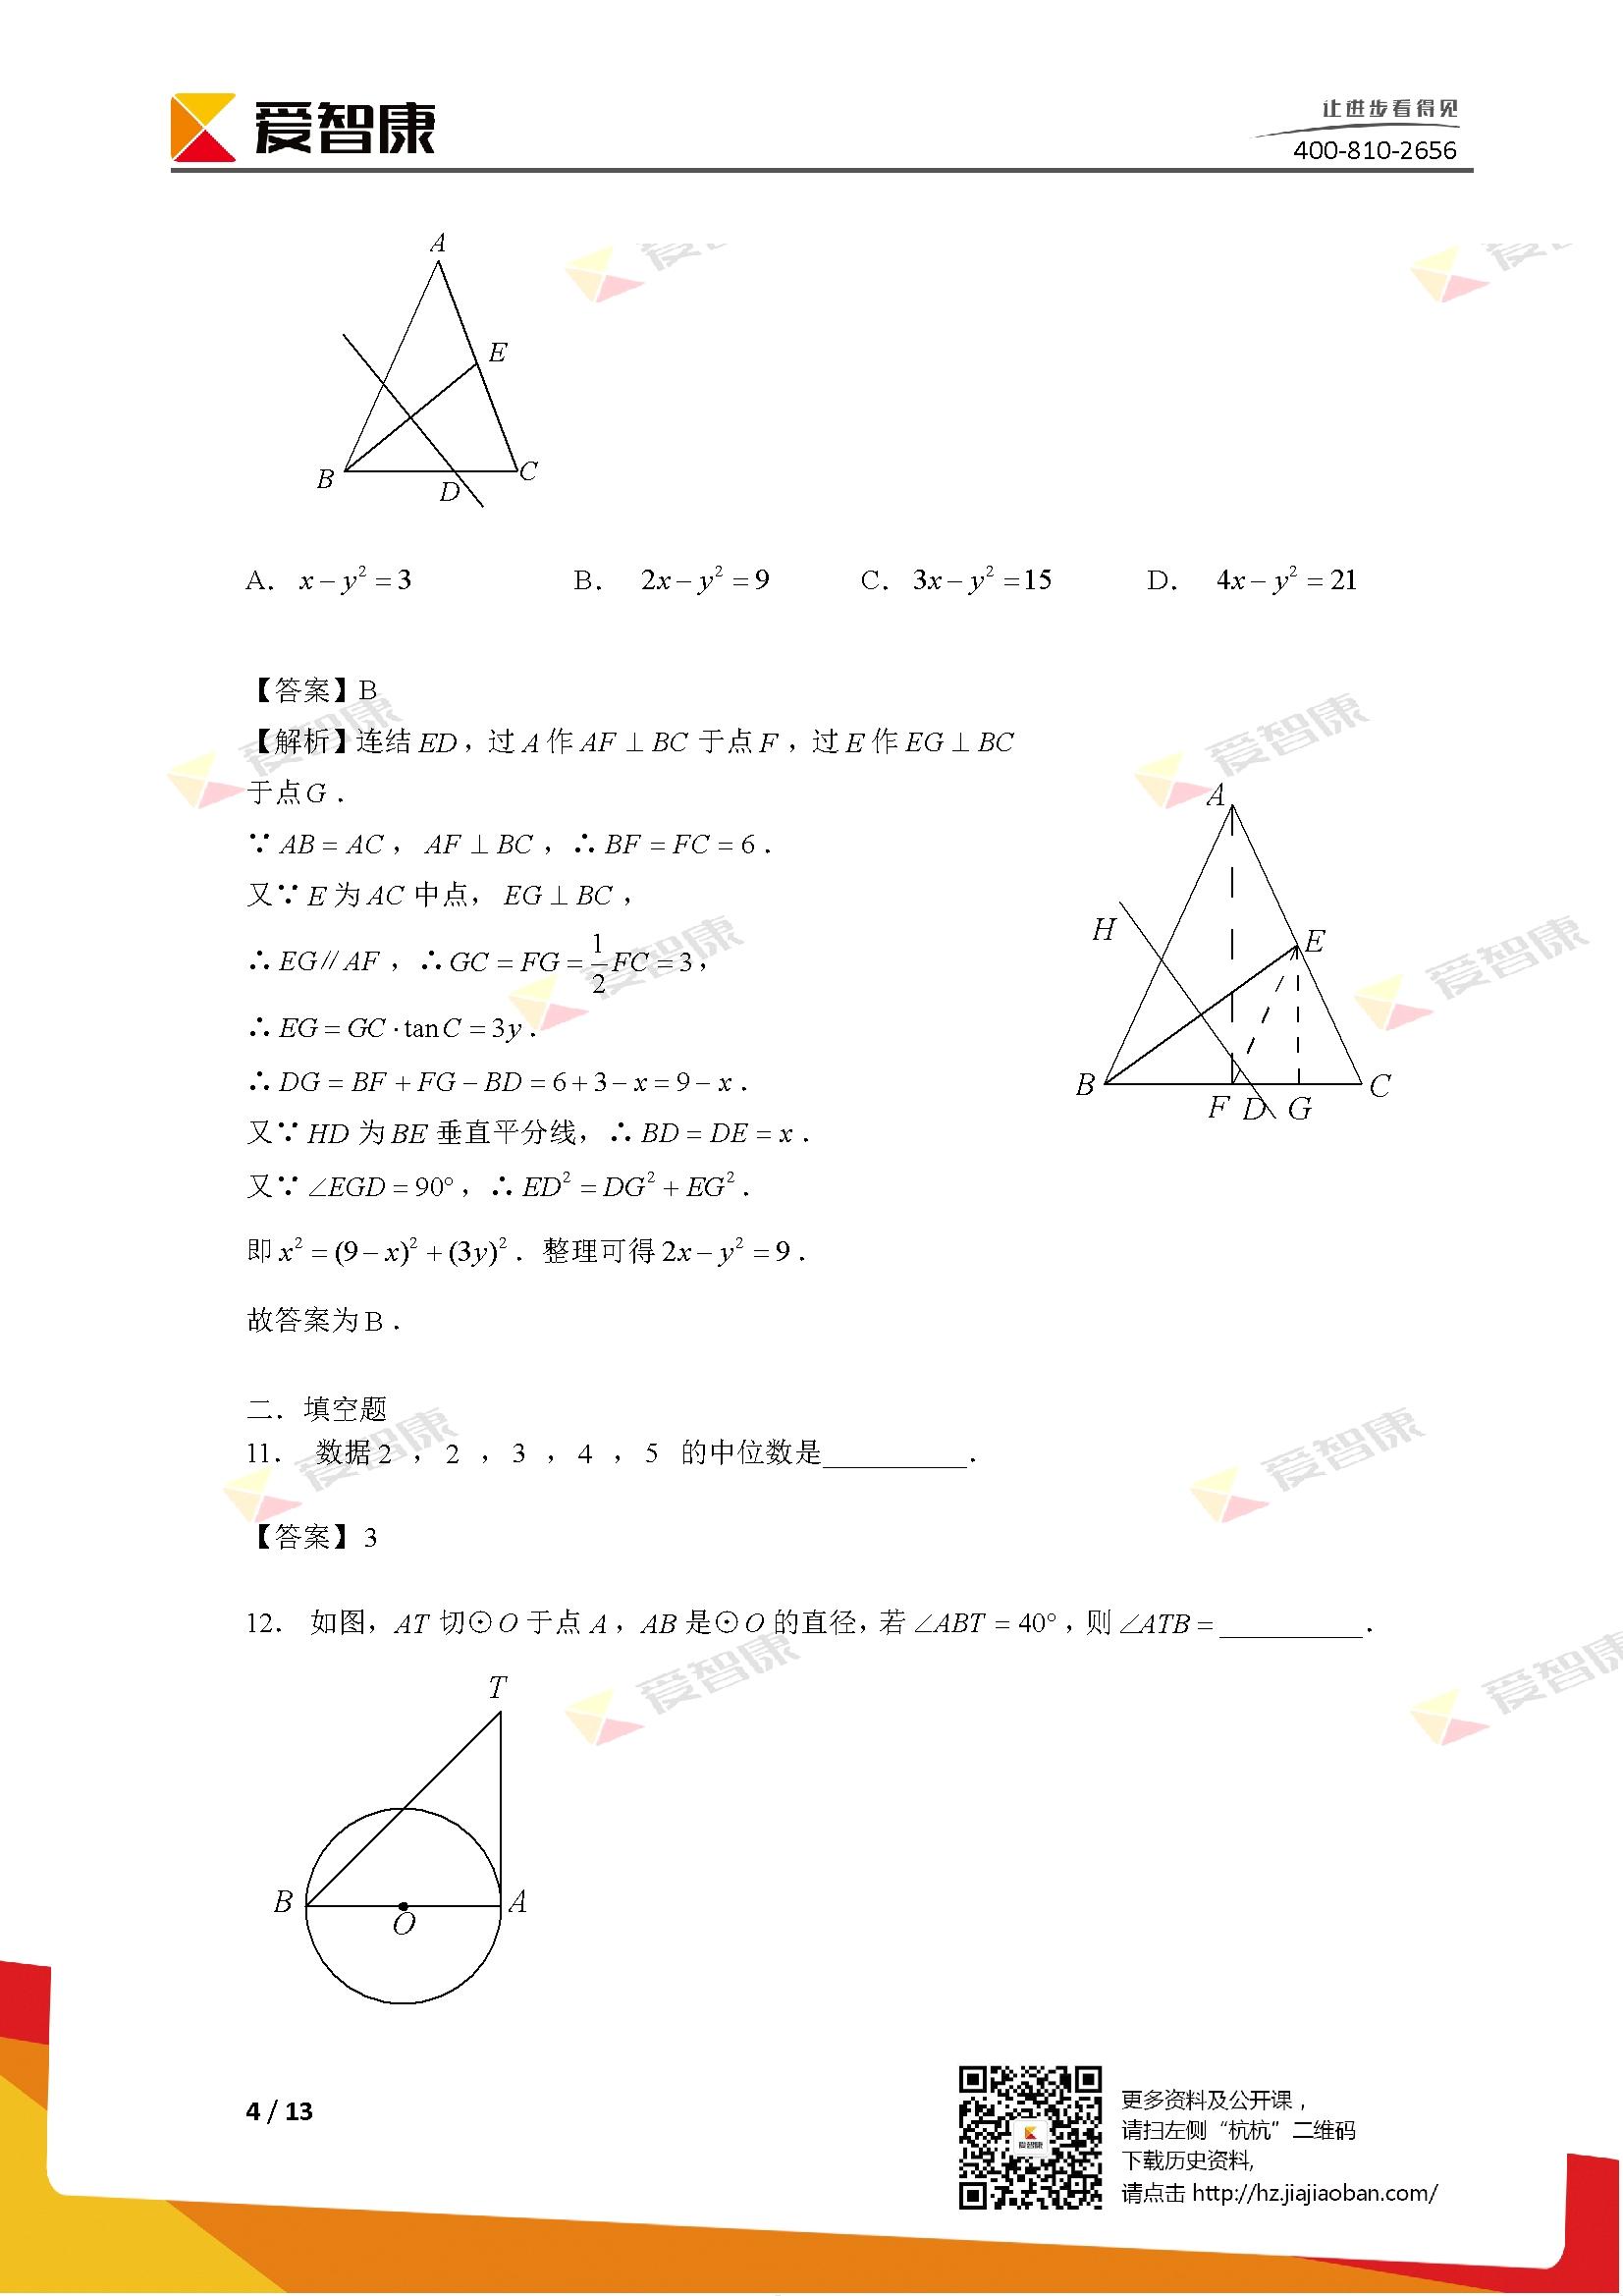 Microsoft Word - 2017年杭州市中考数学试卷解析24.jpg